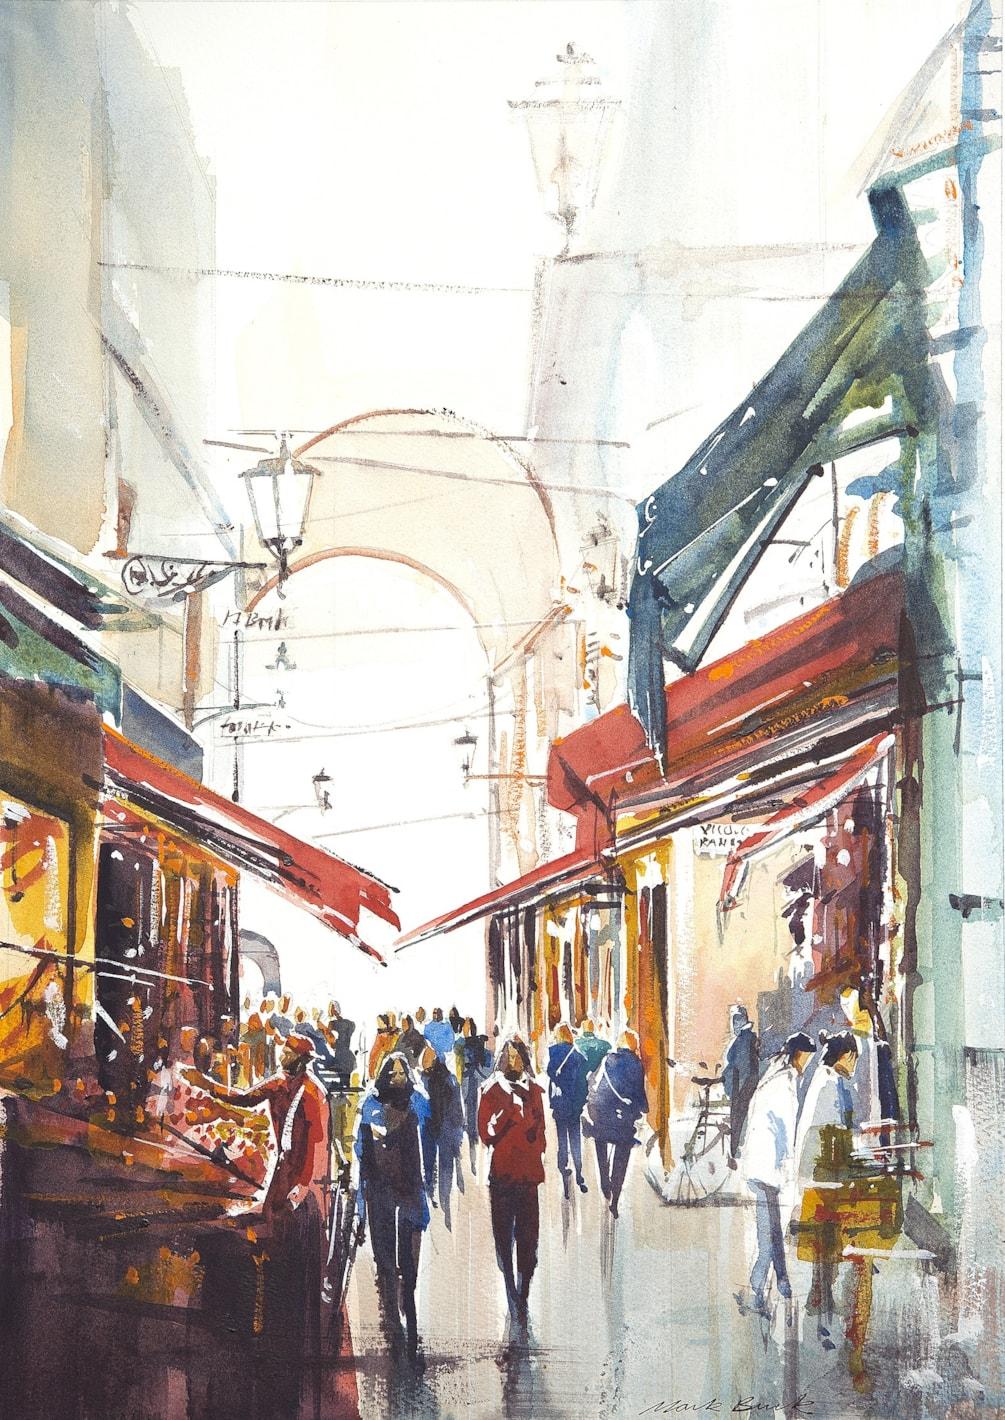 Bologna market in Via Pescherie Vecchie